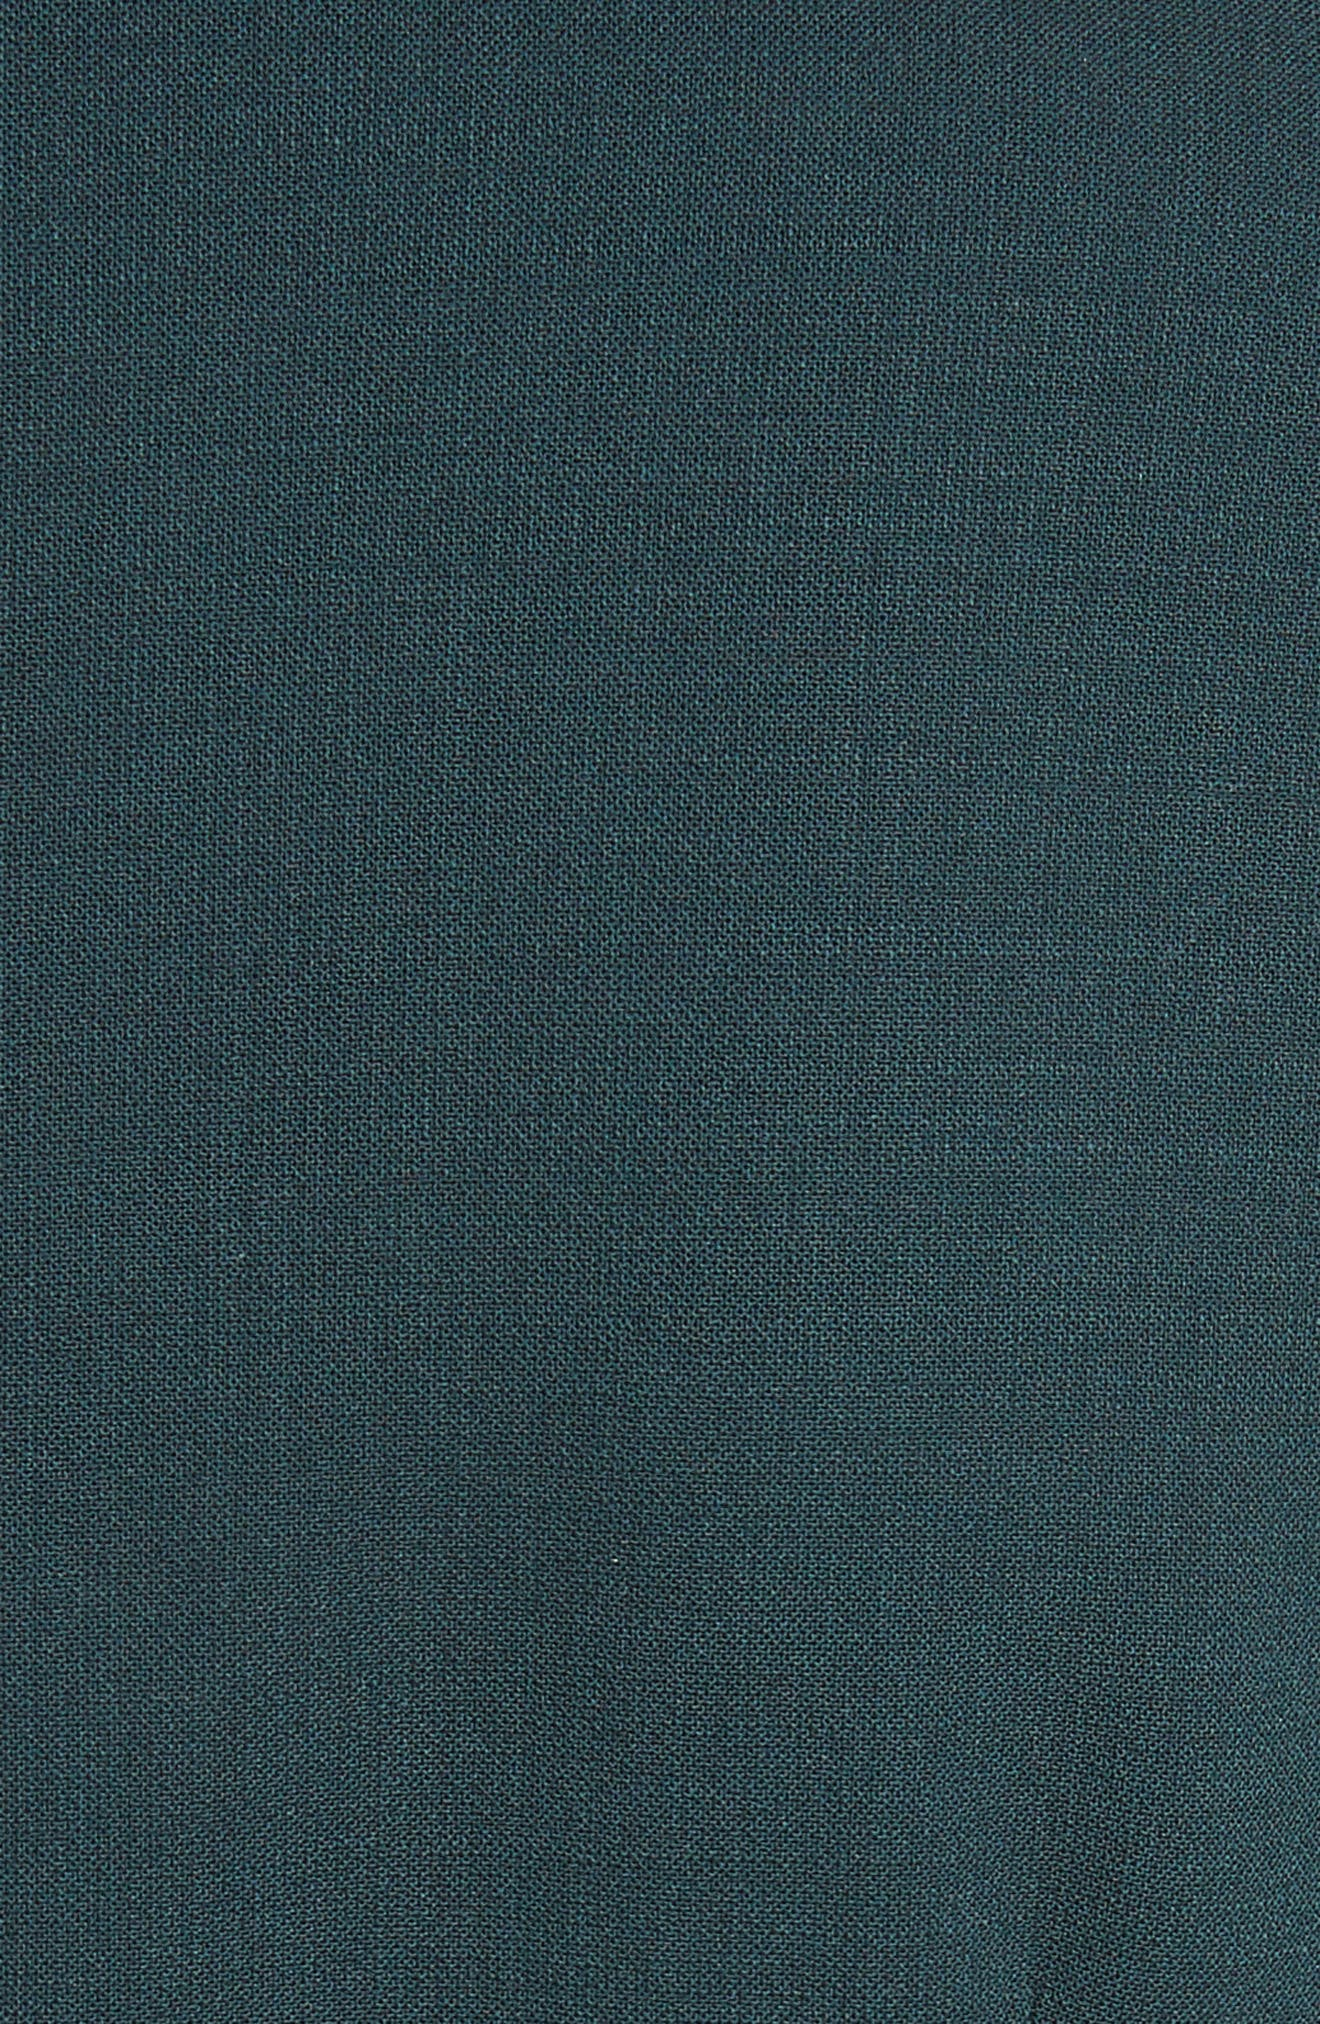 Umano Stretch Wool Sheath Dress,                             Alternate thumbnail 6, color,                             Dark Green